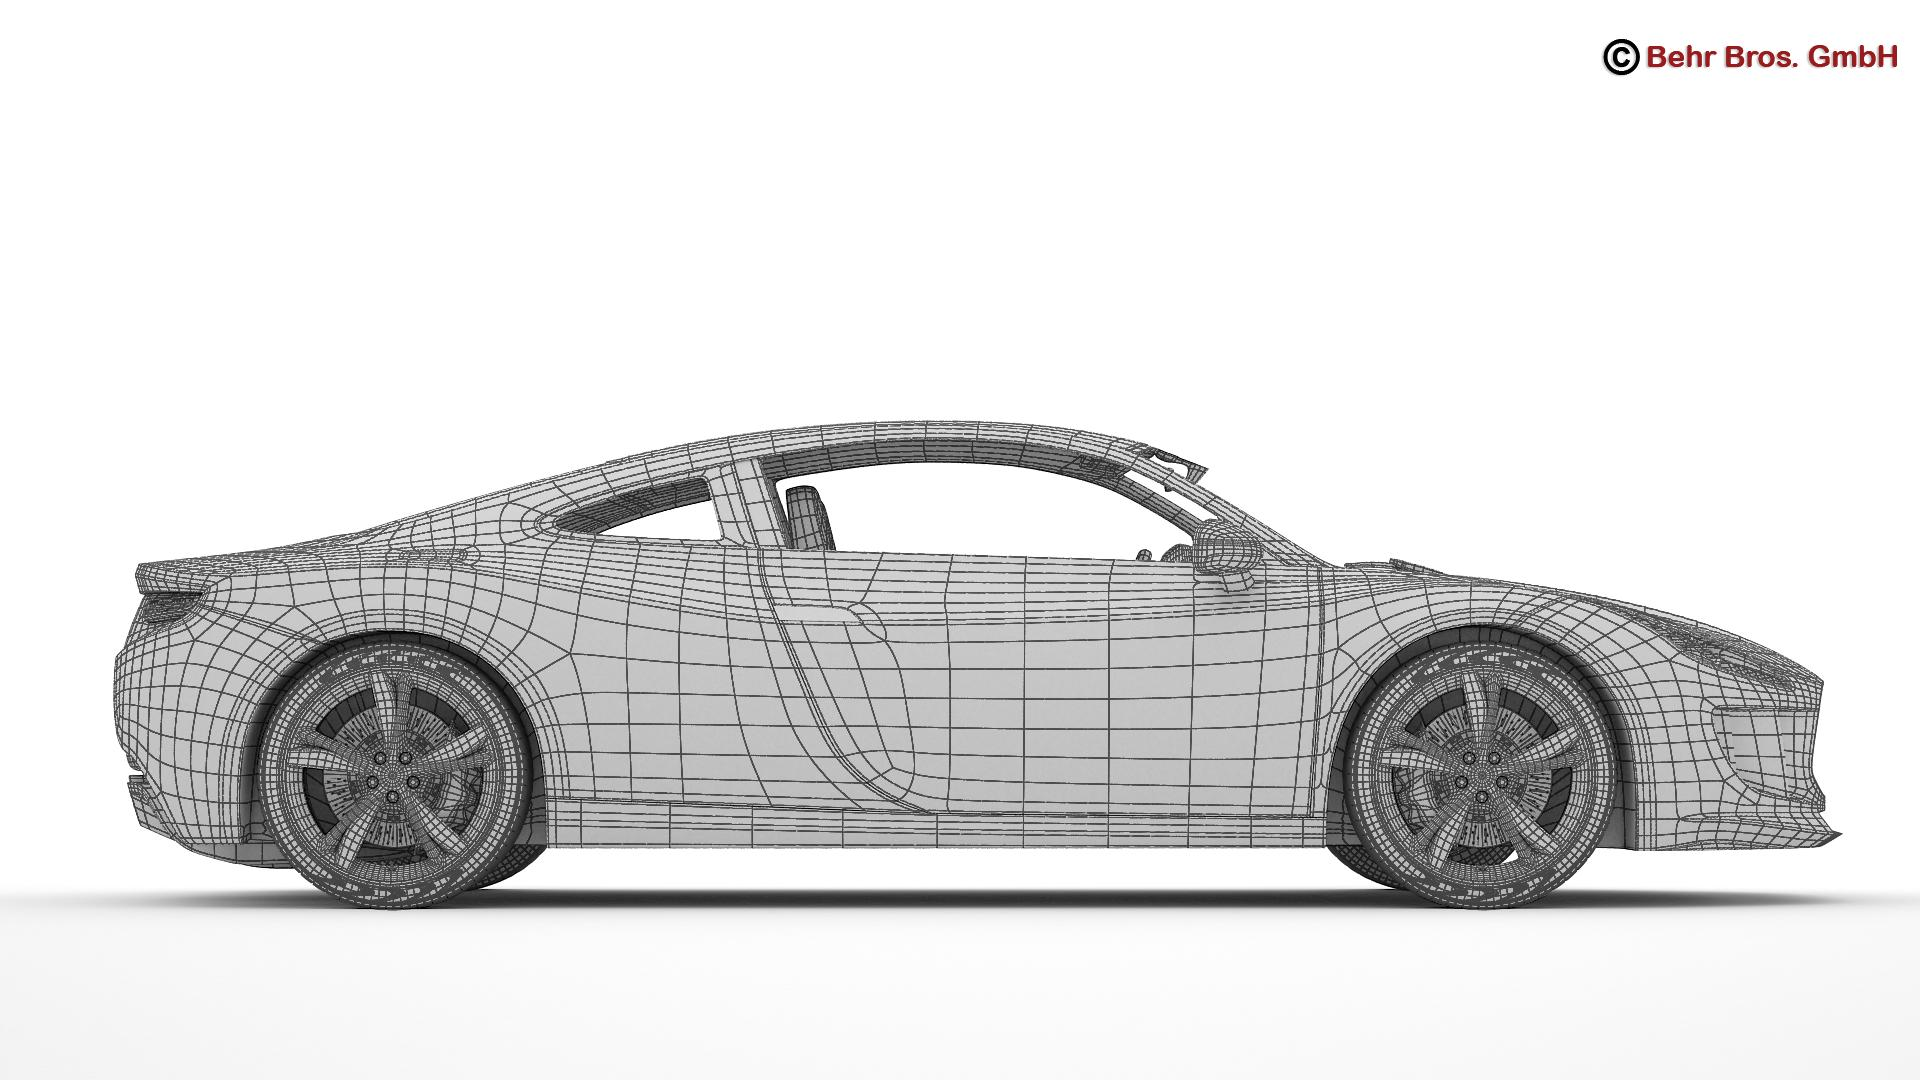 generic sports car 3d model 3ds max fbx c4d lwo ma mb obj 160539